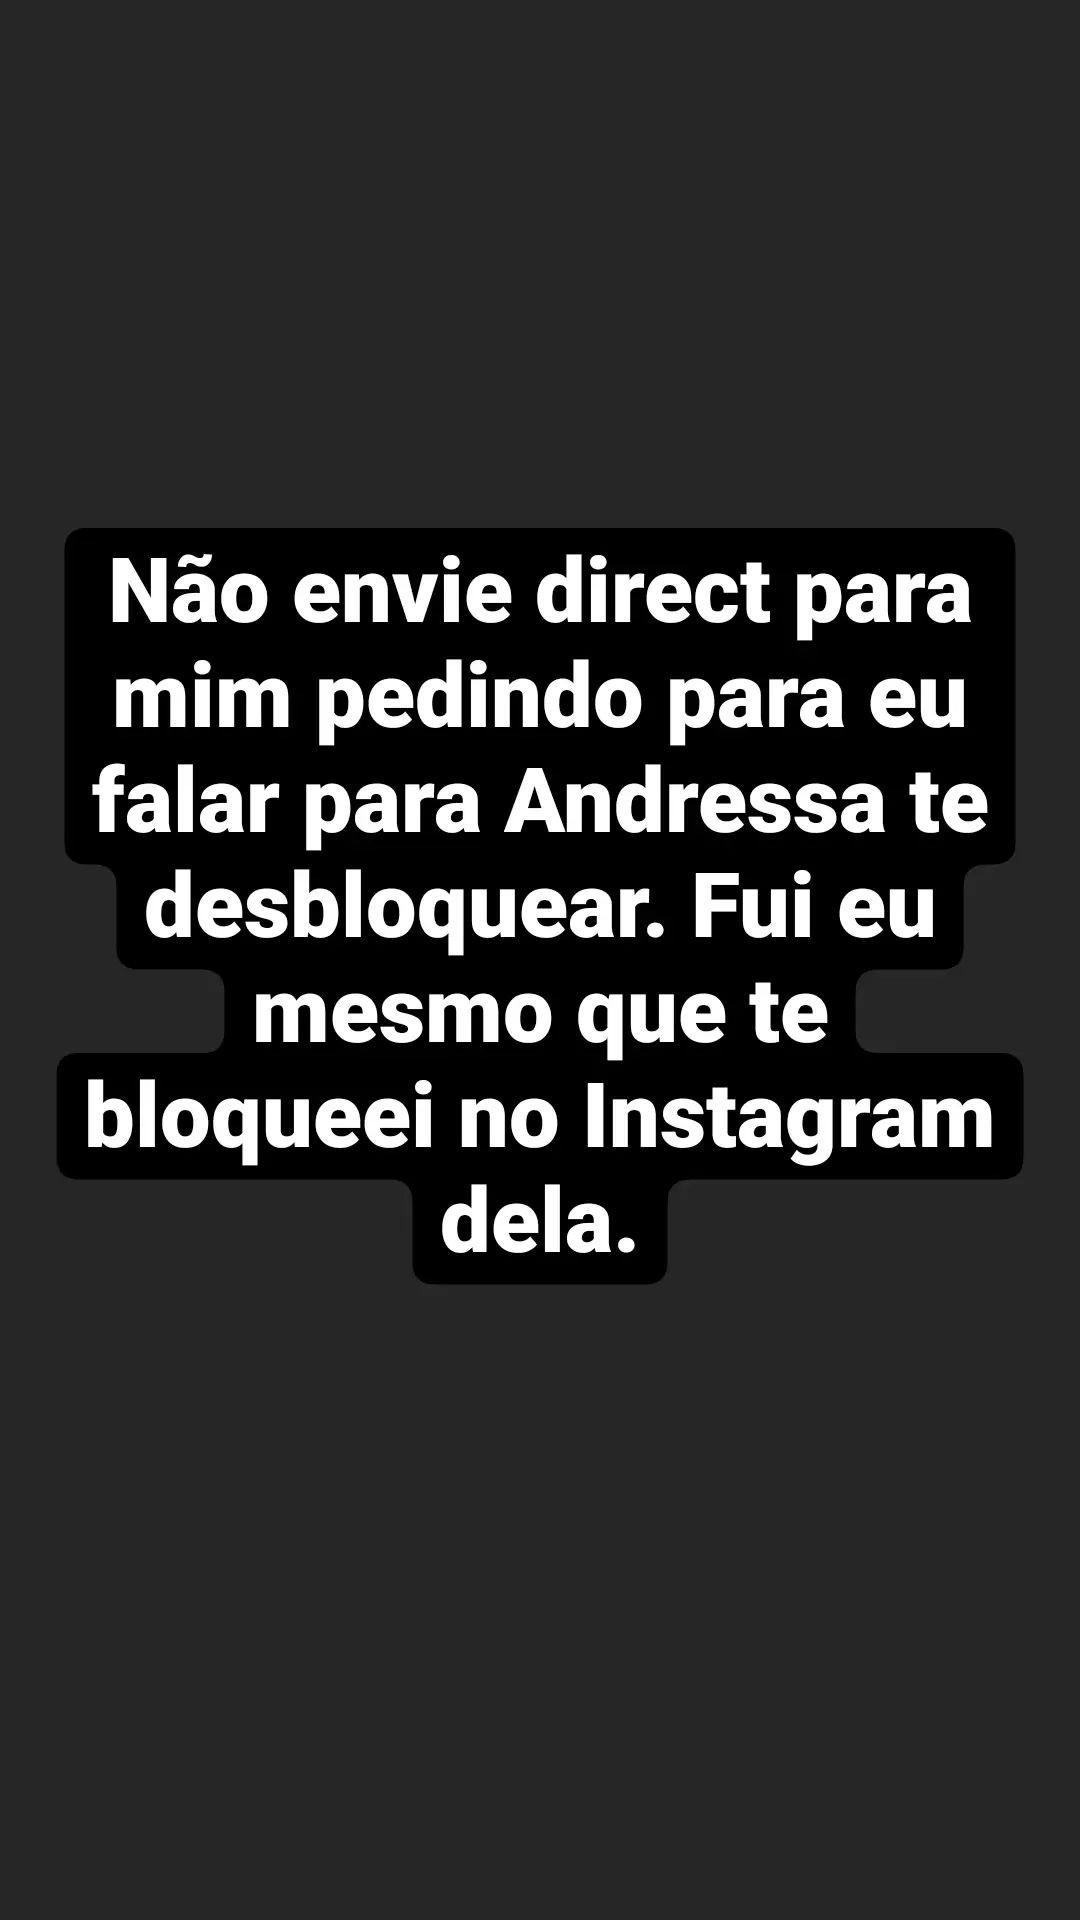 Marido de Andressa Urach assume as redes sociais da modelo e bloqueia seguidores